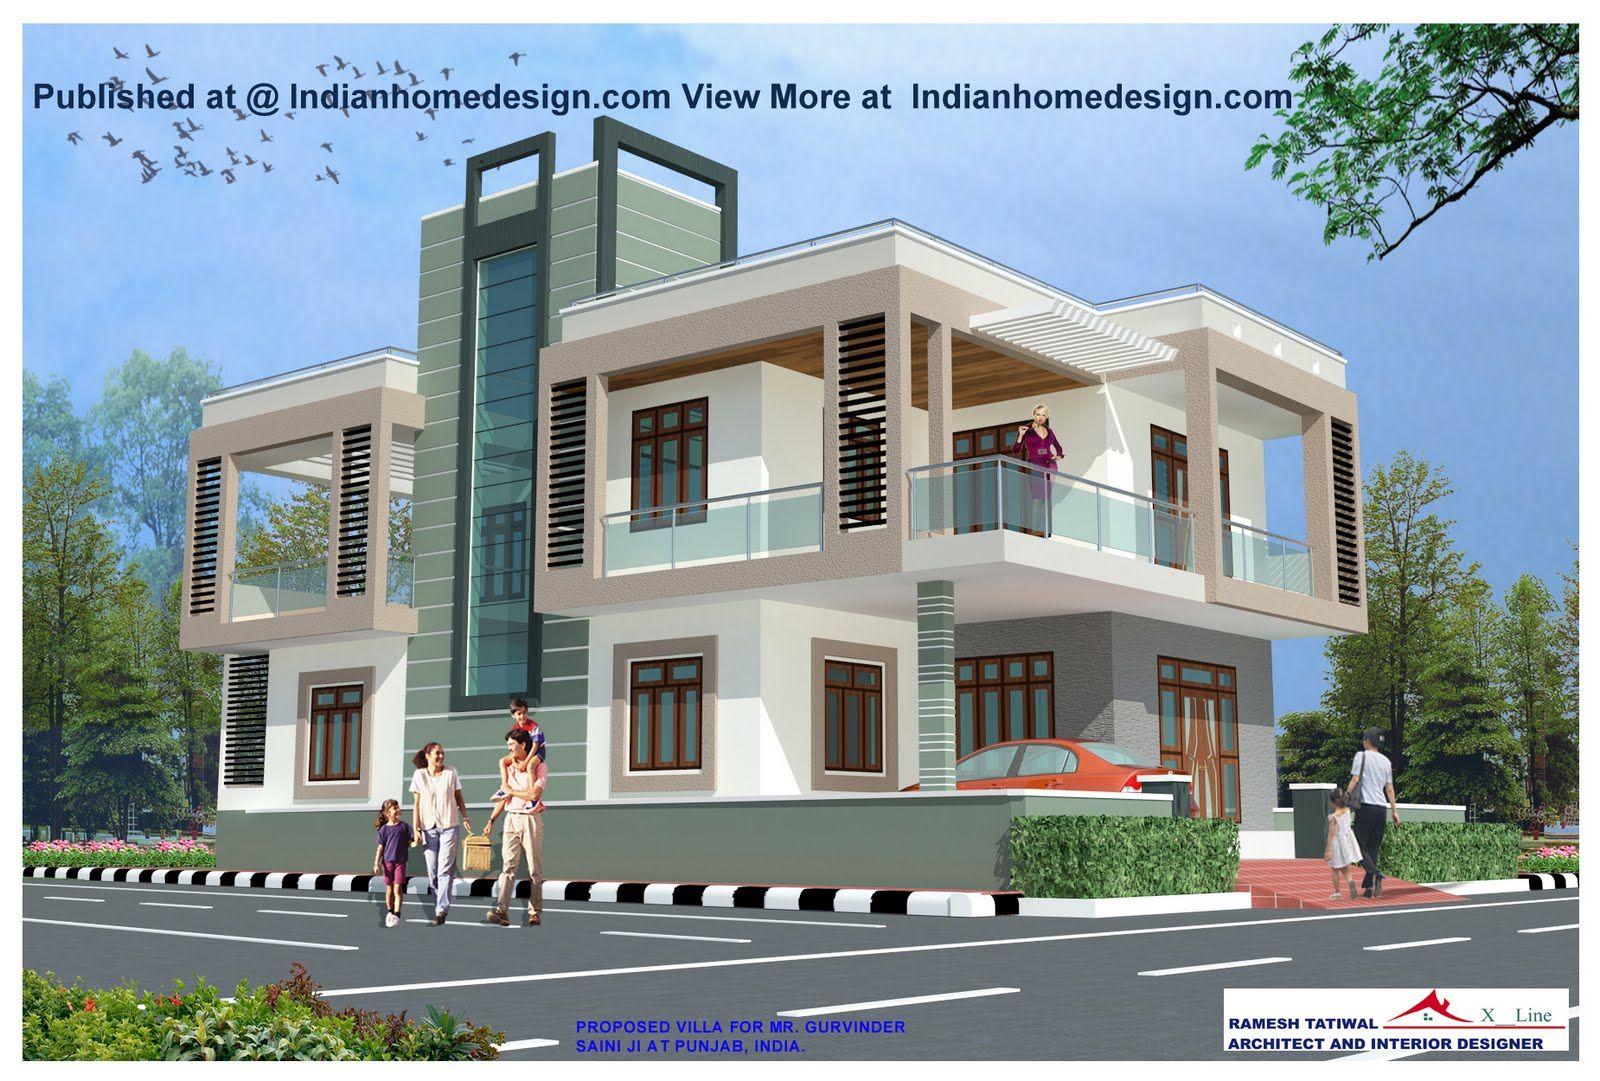 Hausfrontdesign in rajasthan exteriorexteriorhousedesignsideaswithlevelfloorsand